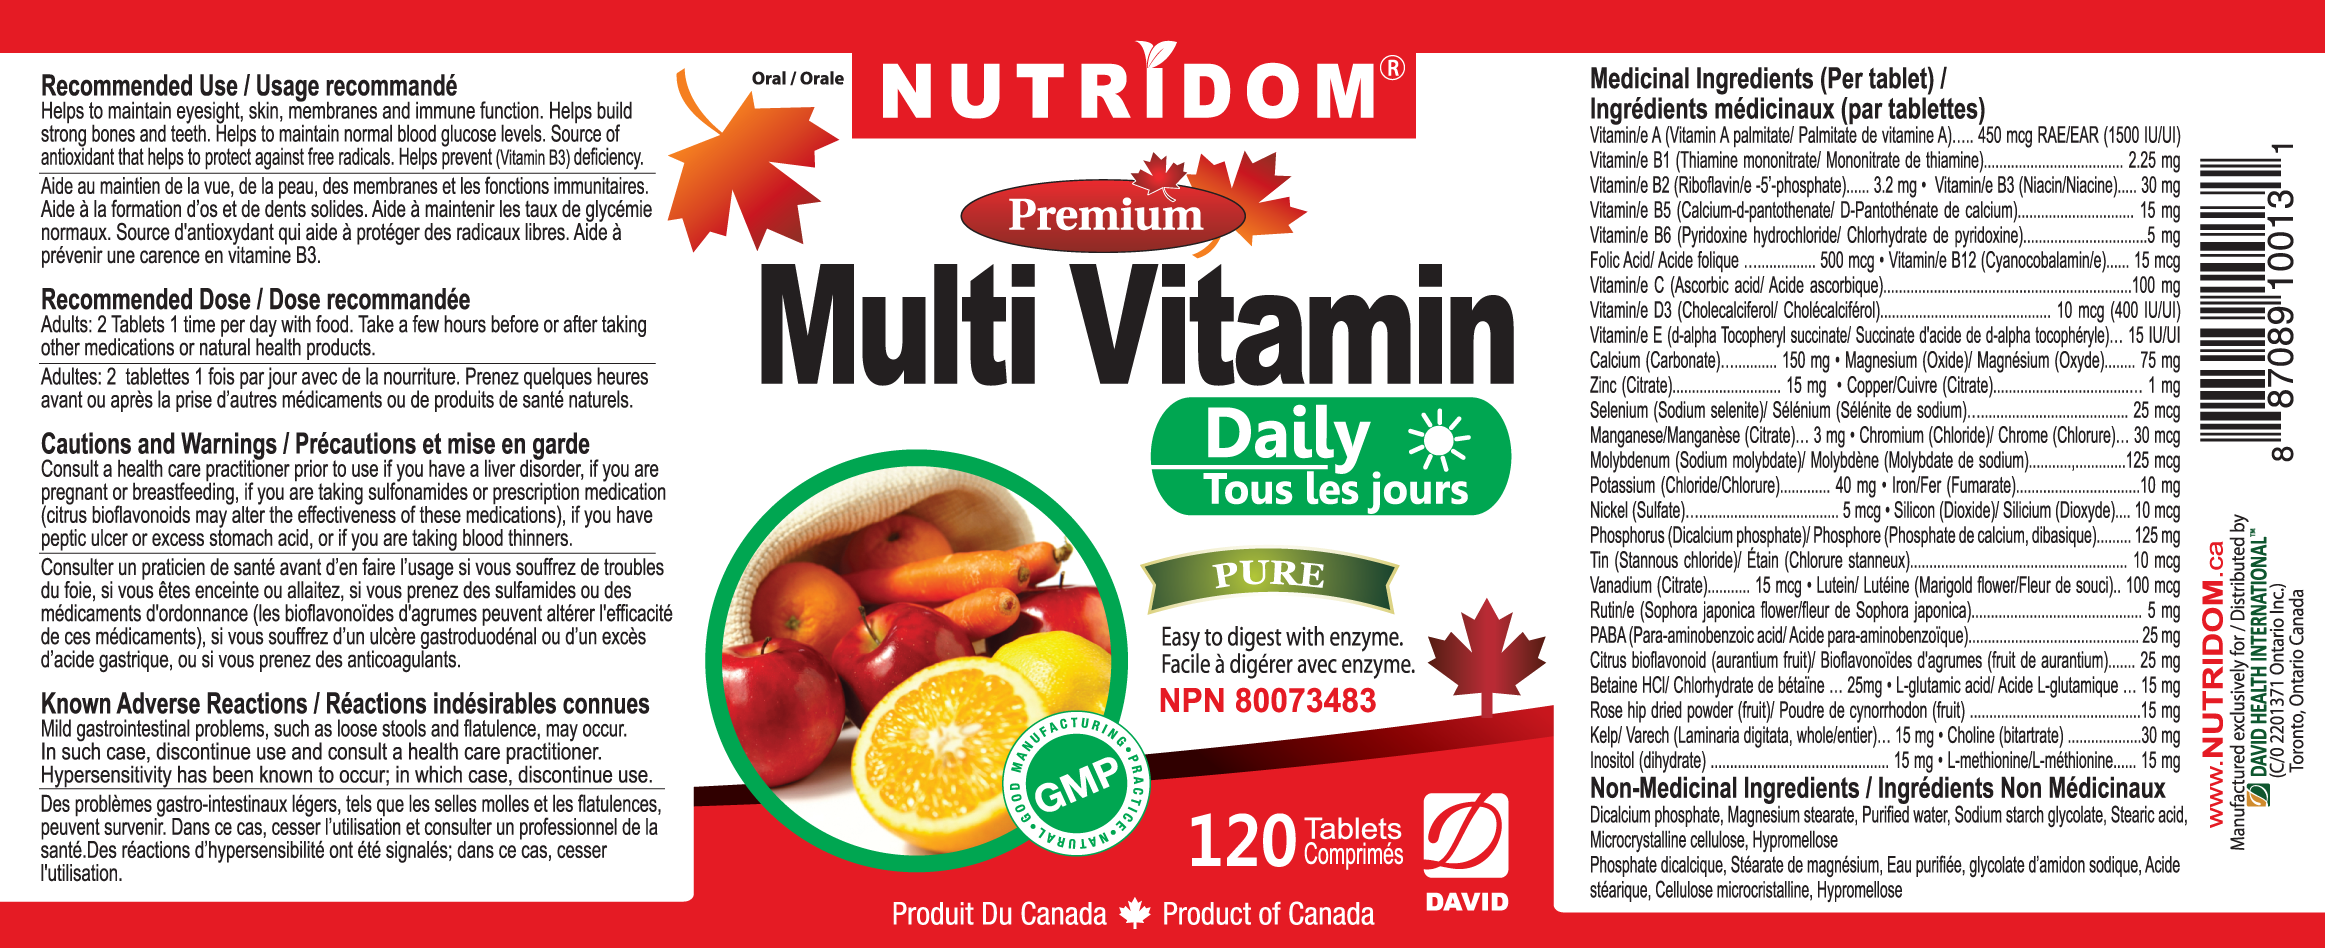 Nutridom Multi Vitamin Daily 120 Tablets